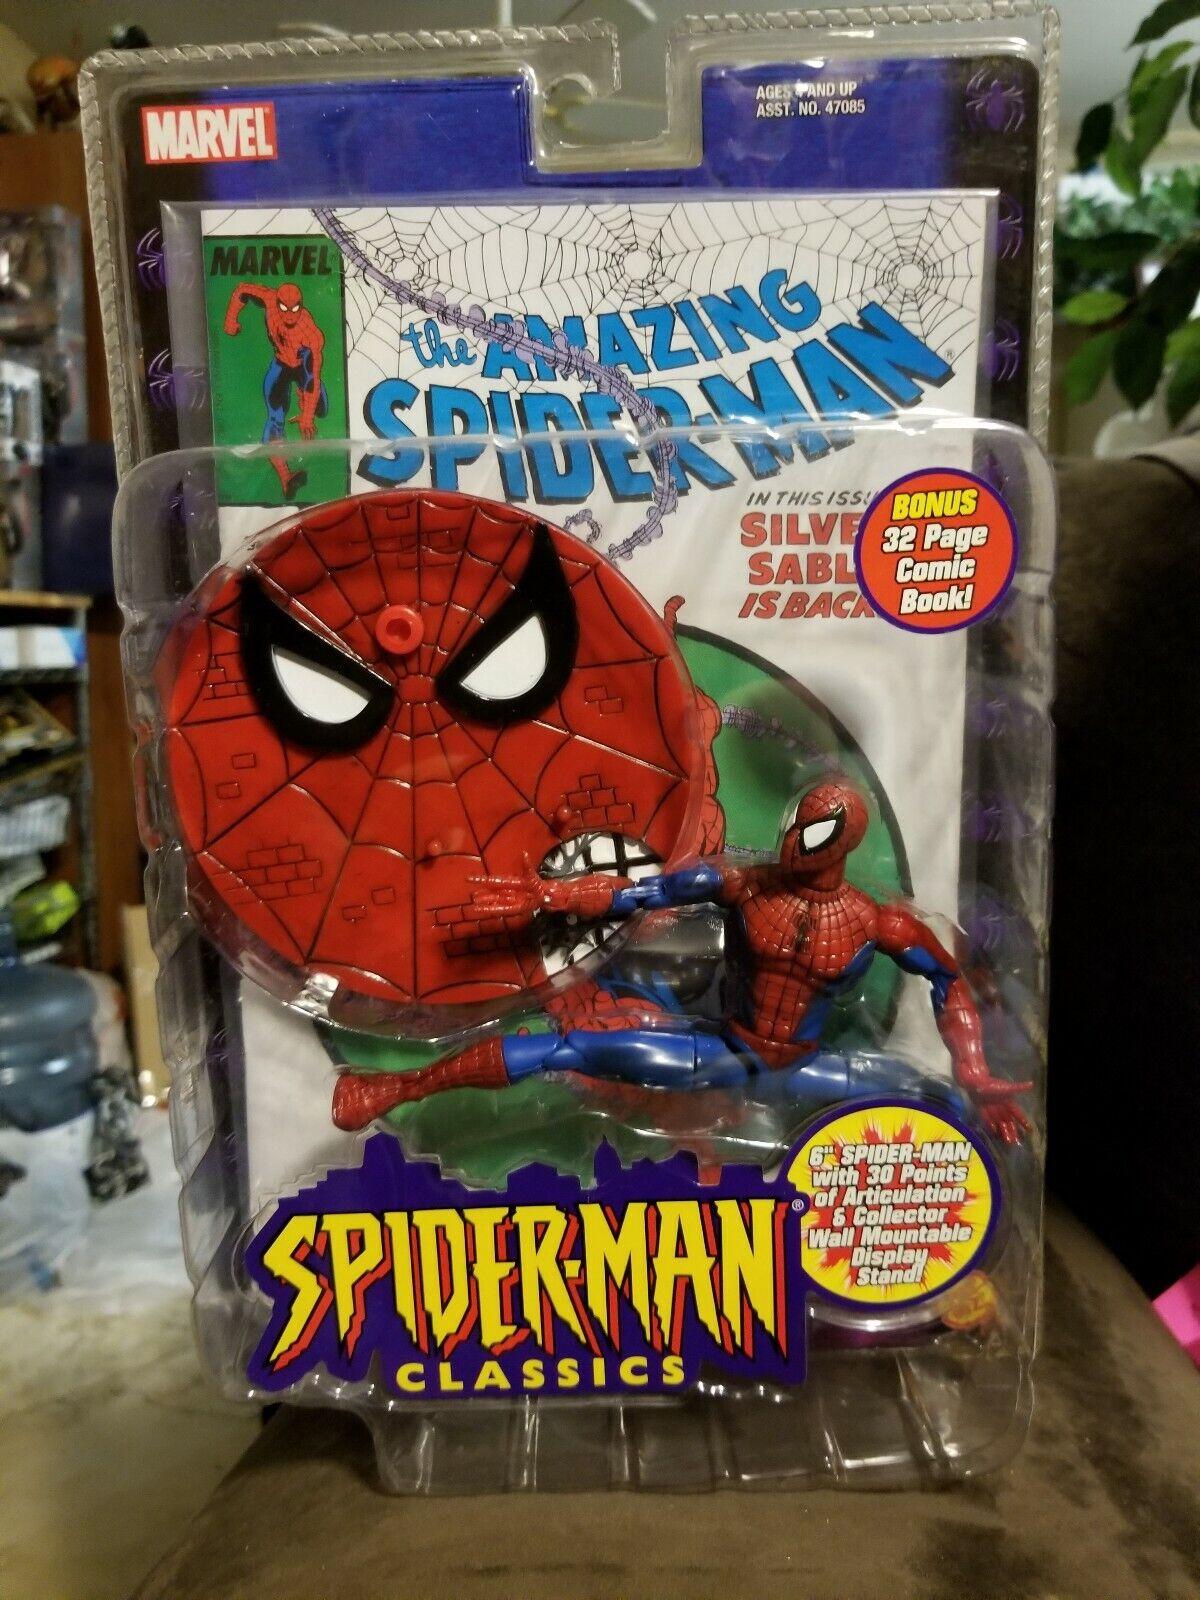 solo cómpralo TOY BIZ figuras figuras figuras de acción MARVEL leyendas clásicos 2000 The Amazing Spider-Man  de moda